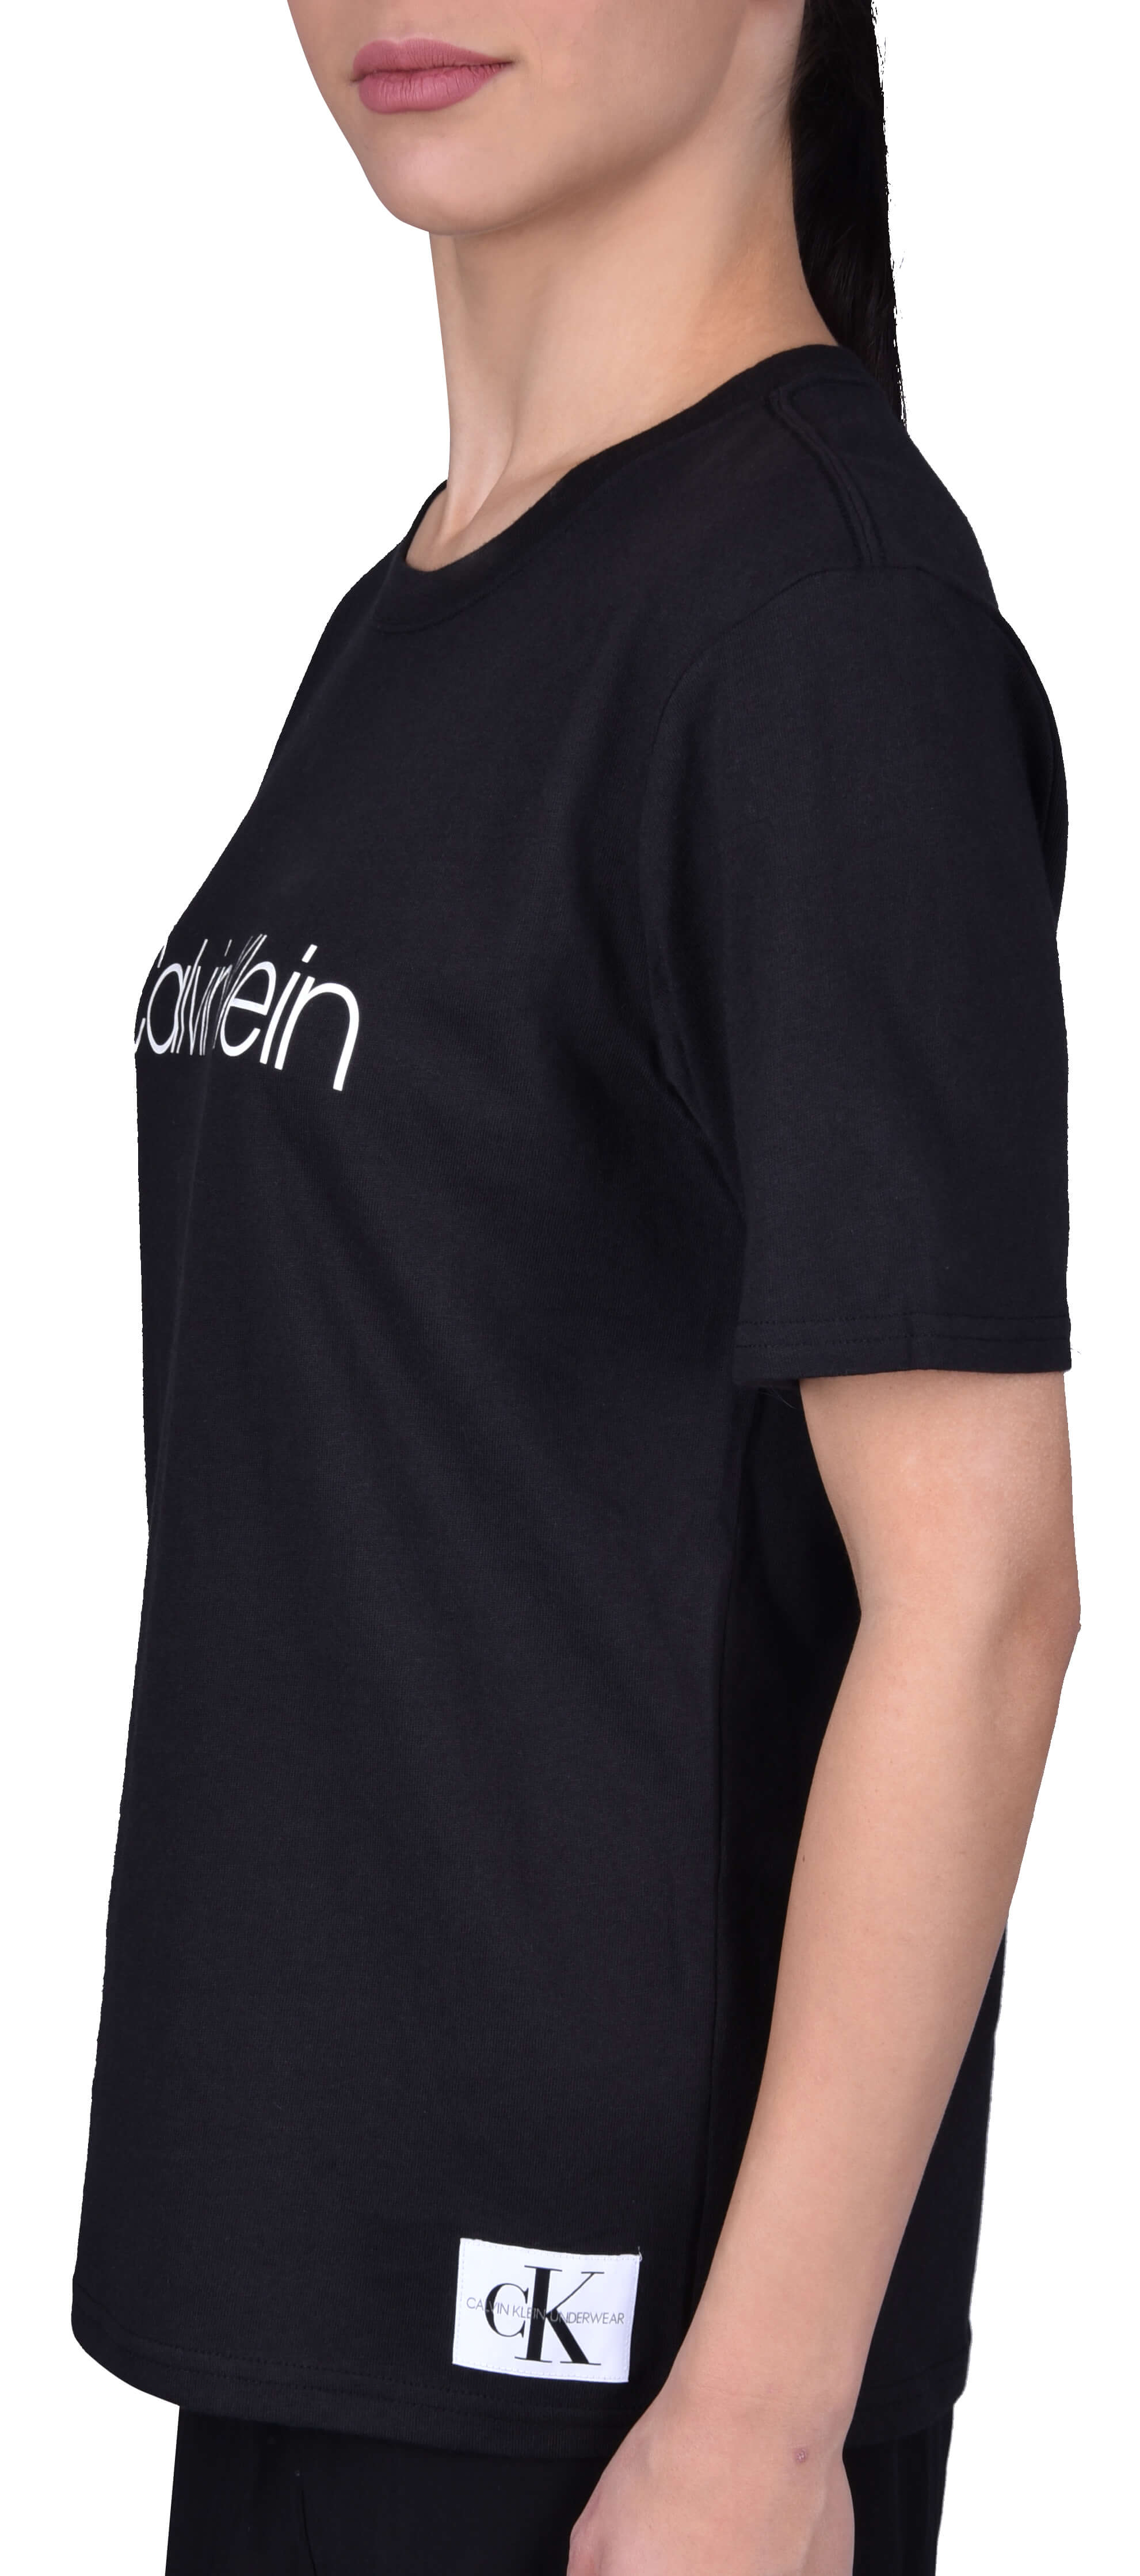 Calvin Klein Női póló S   S Crew Neck Black QS6151E -001  ca843fdf39